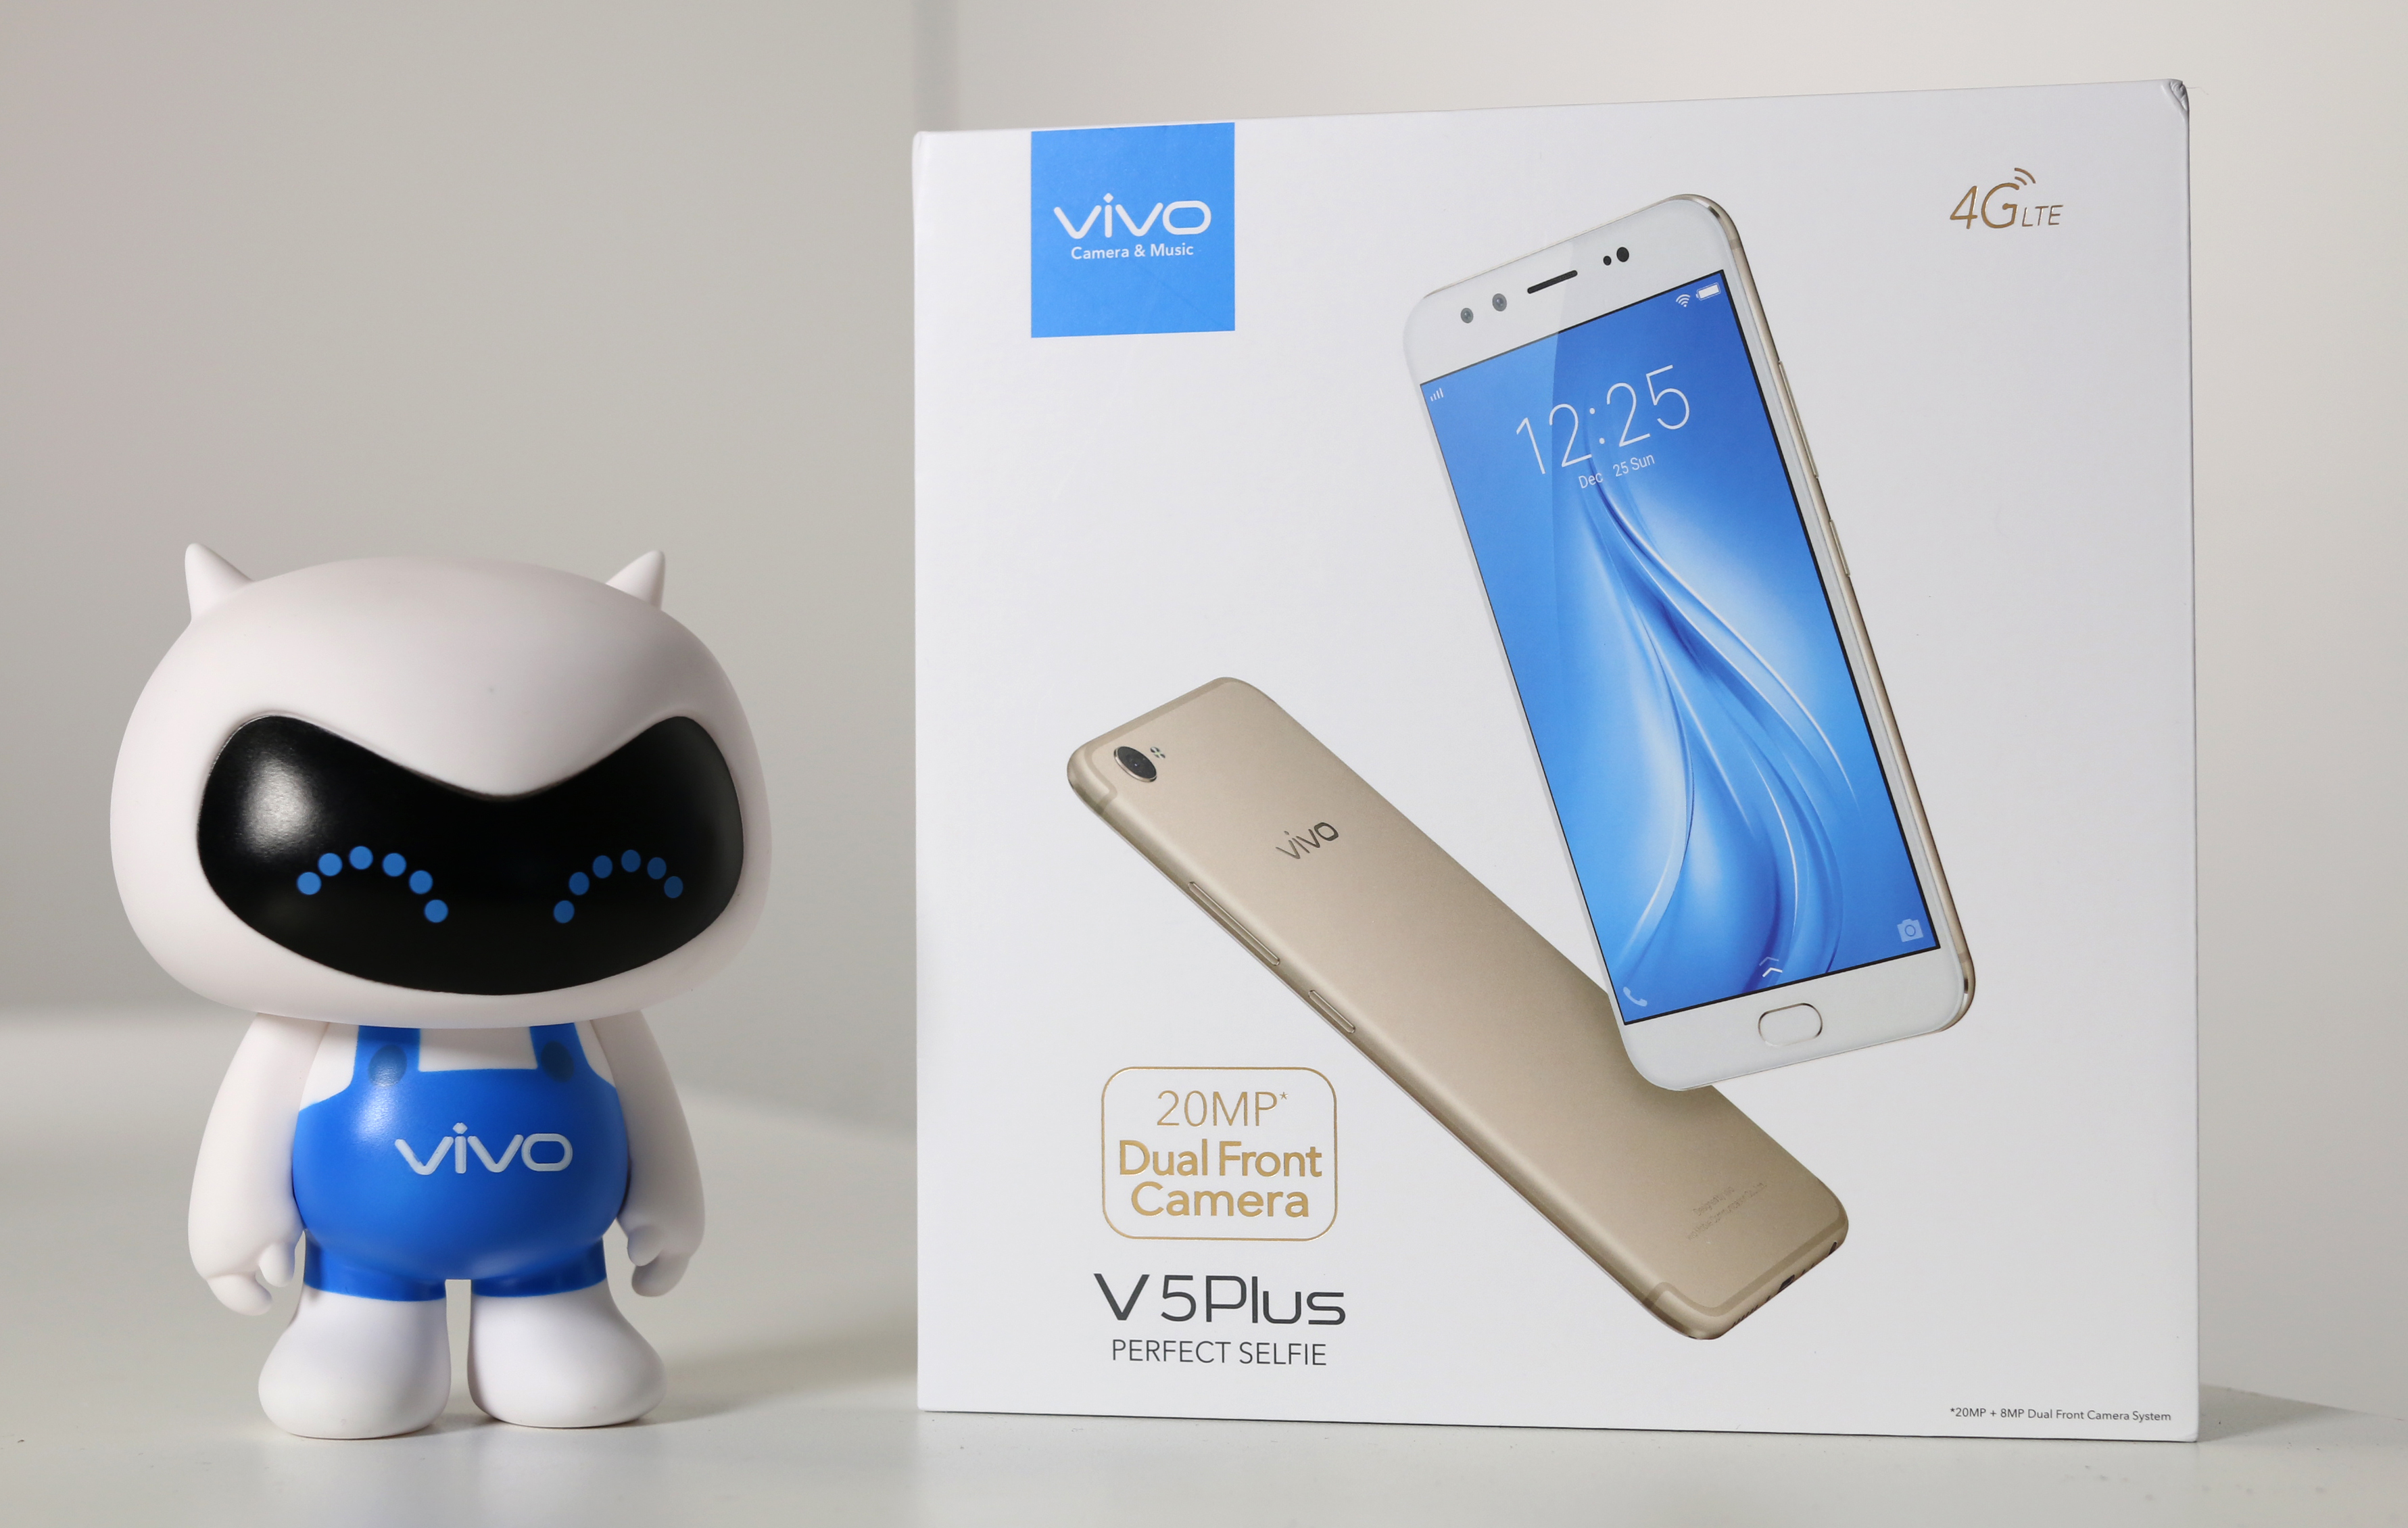 Review : Vivo V5 Plus ถ่ายรูปกล้องหน้าคู่ชัดสะใจความละเอียด 20 MP มา